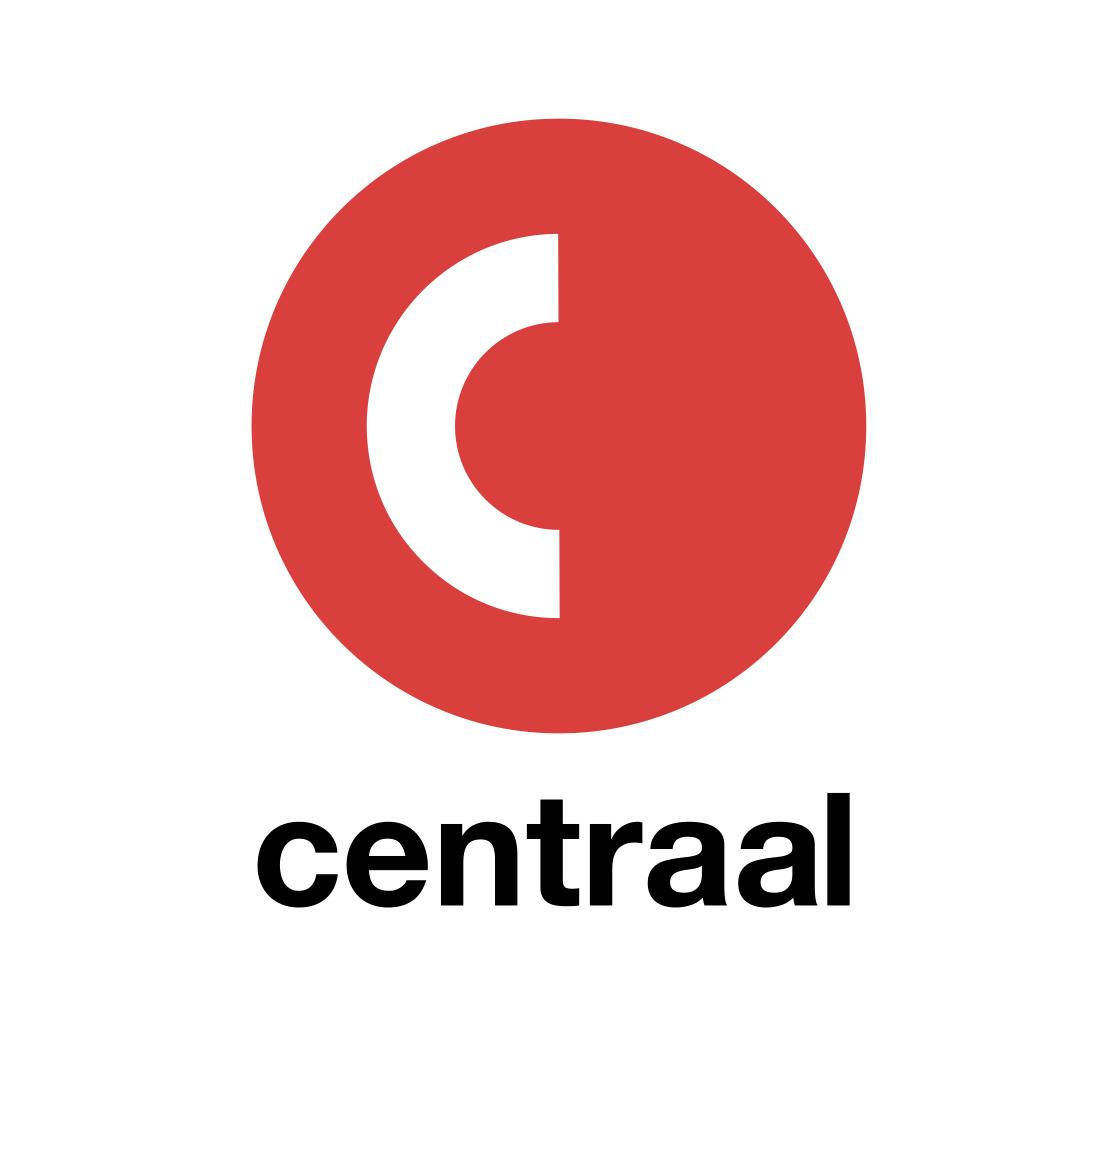 www.centraal.com